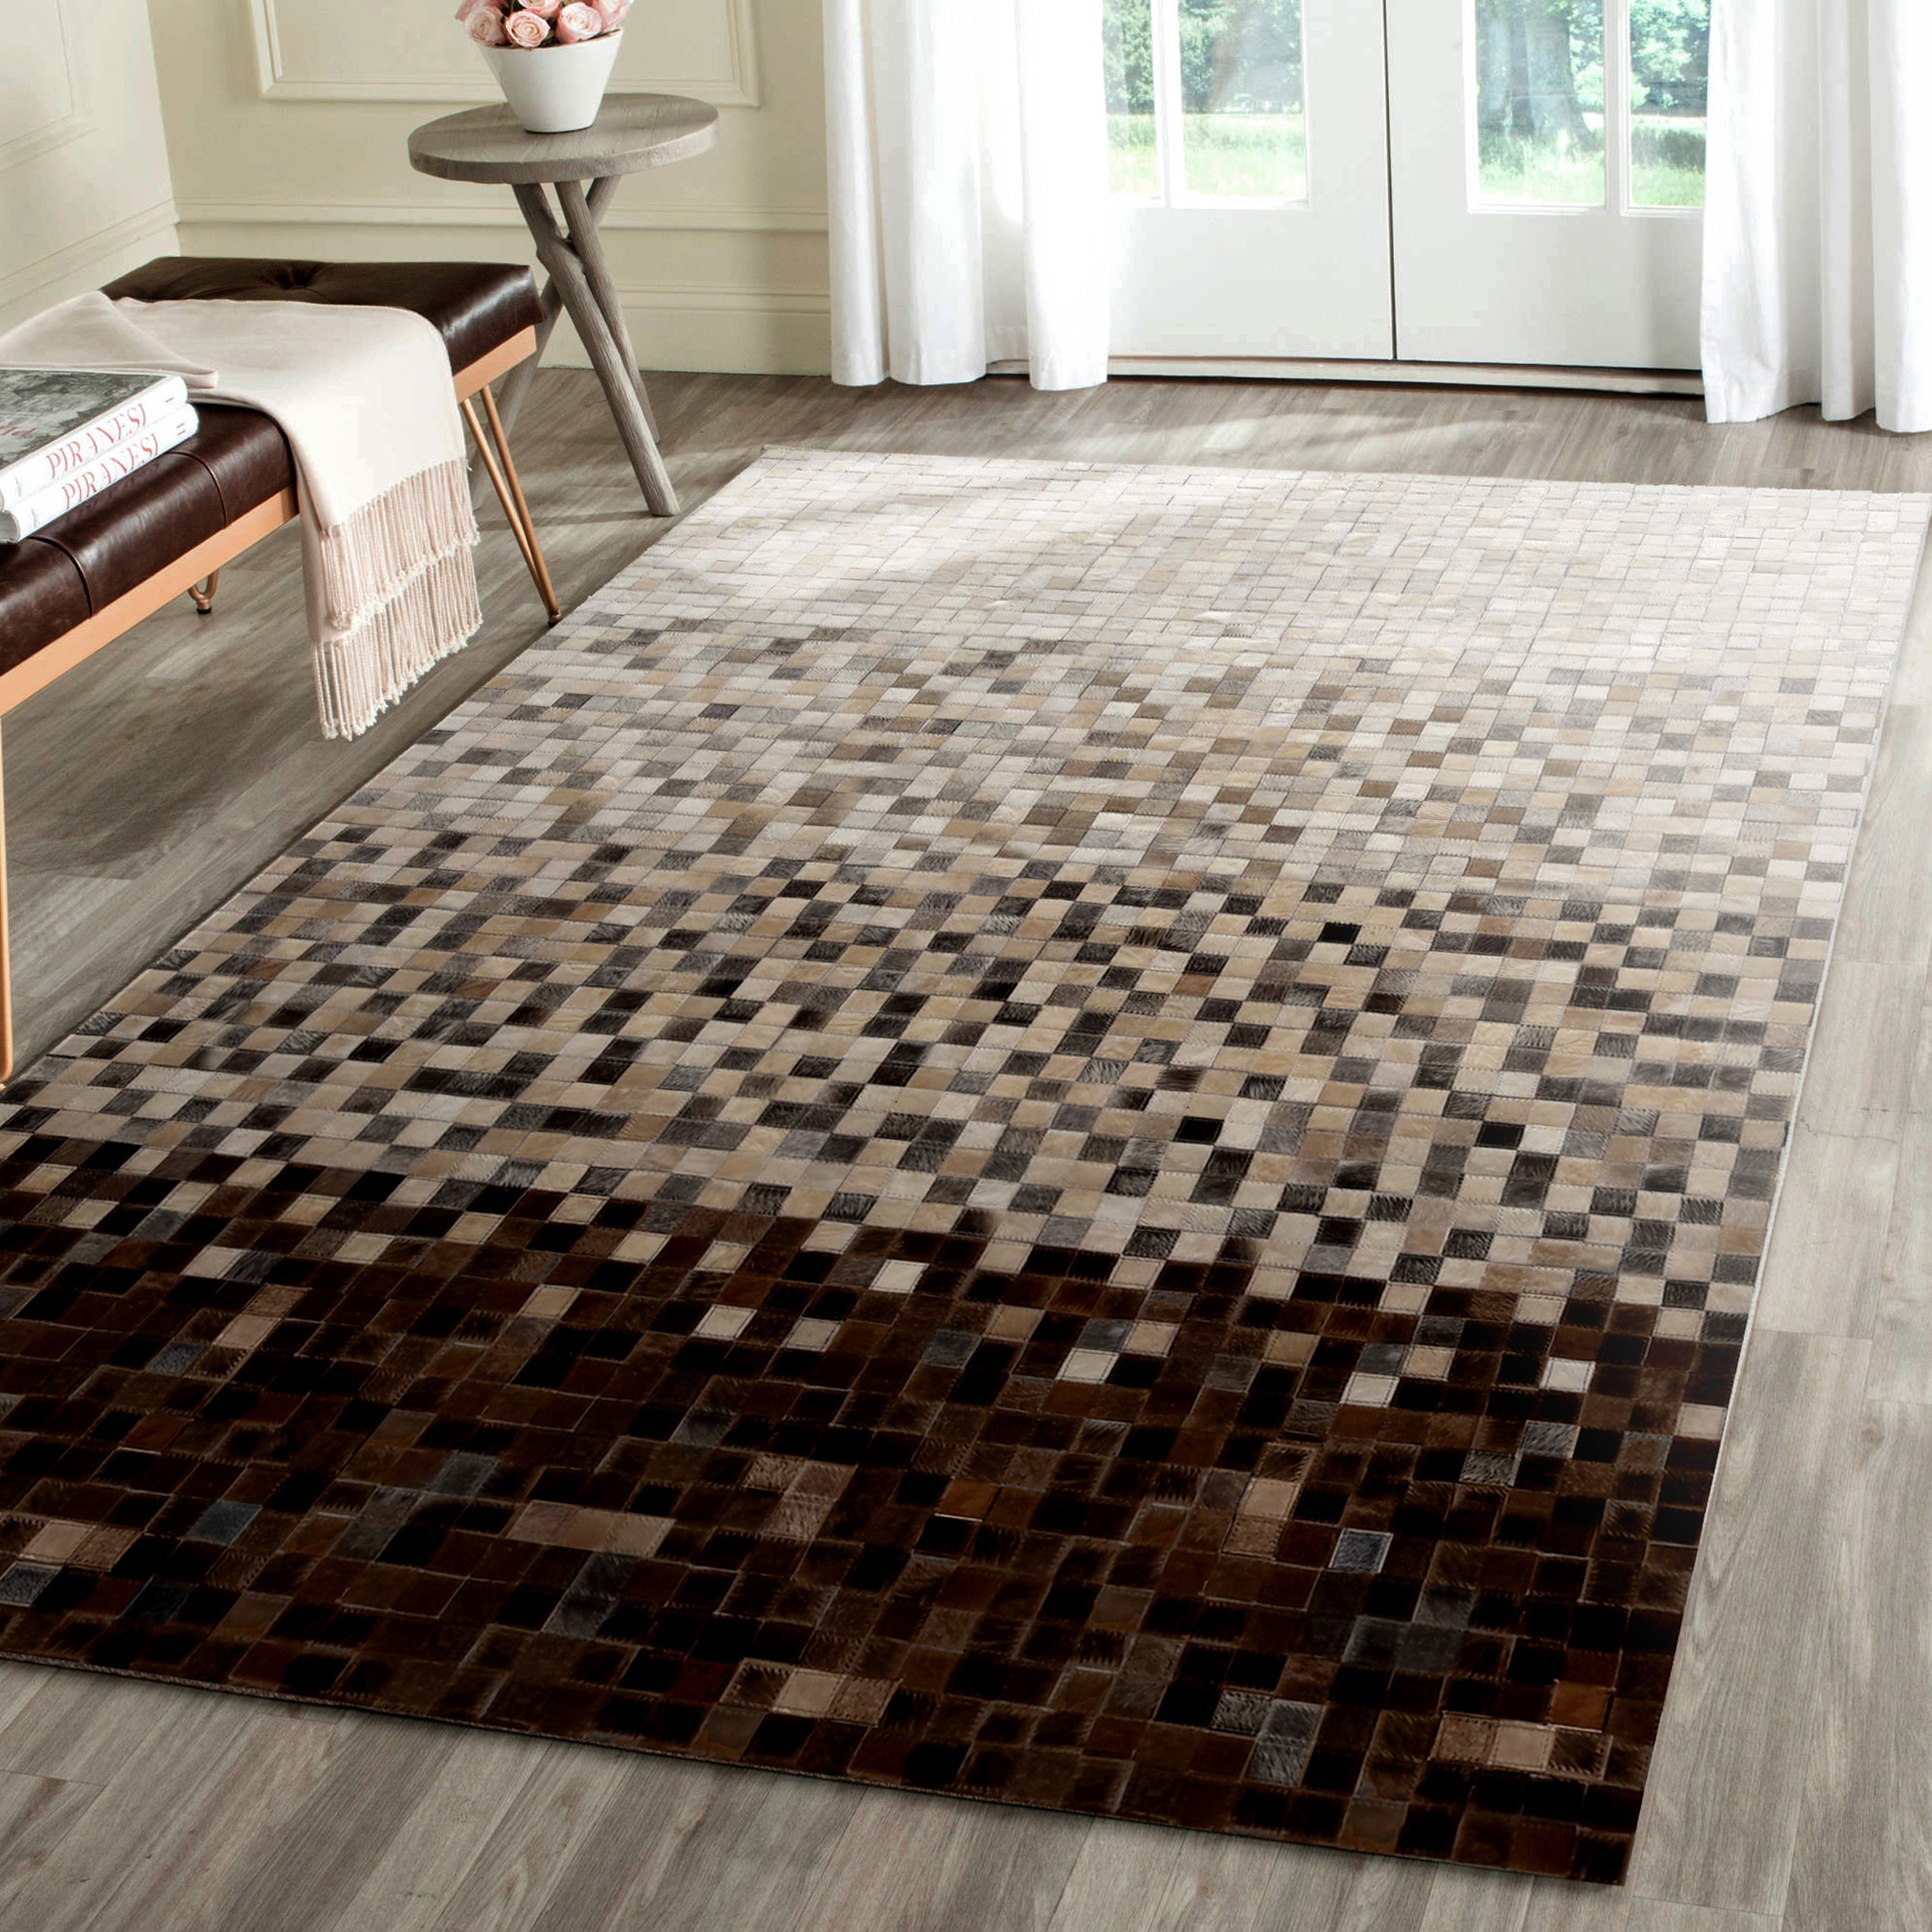 acheter tapis cuir beige marron - Tapis 200x300